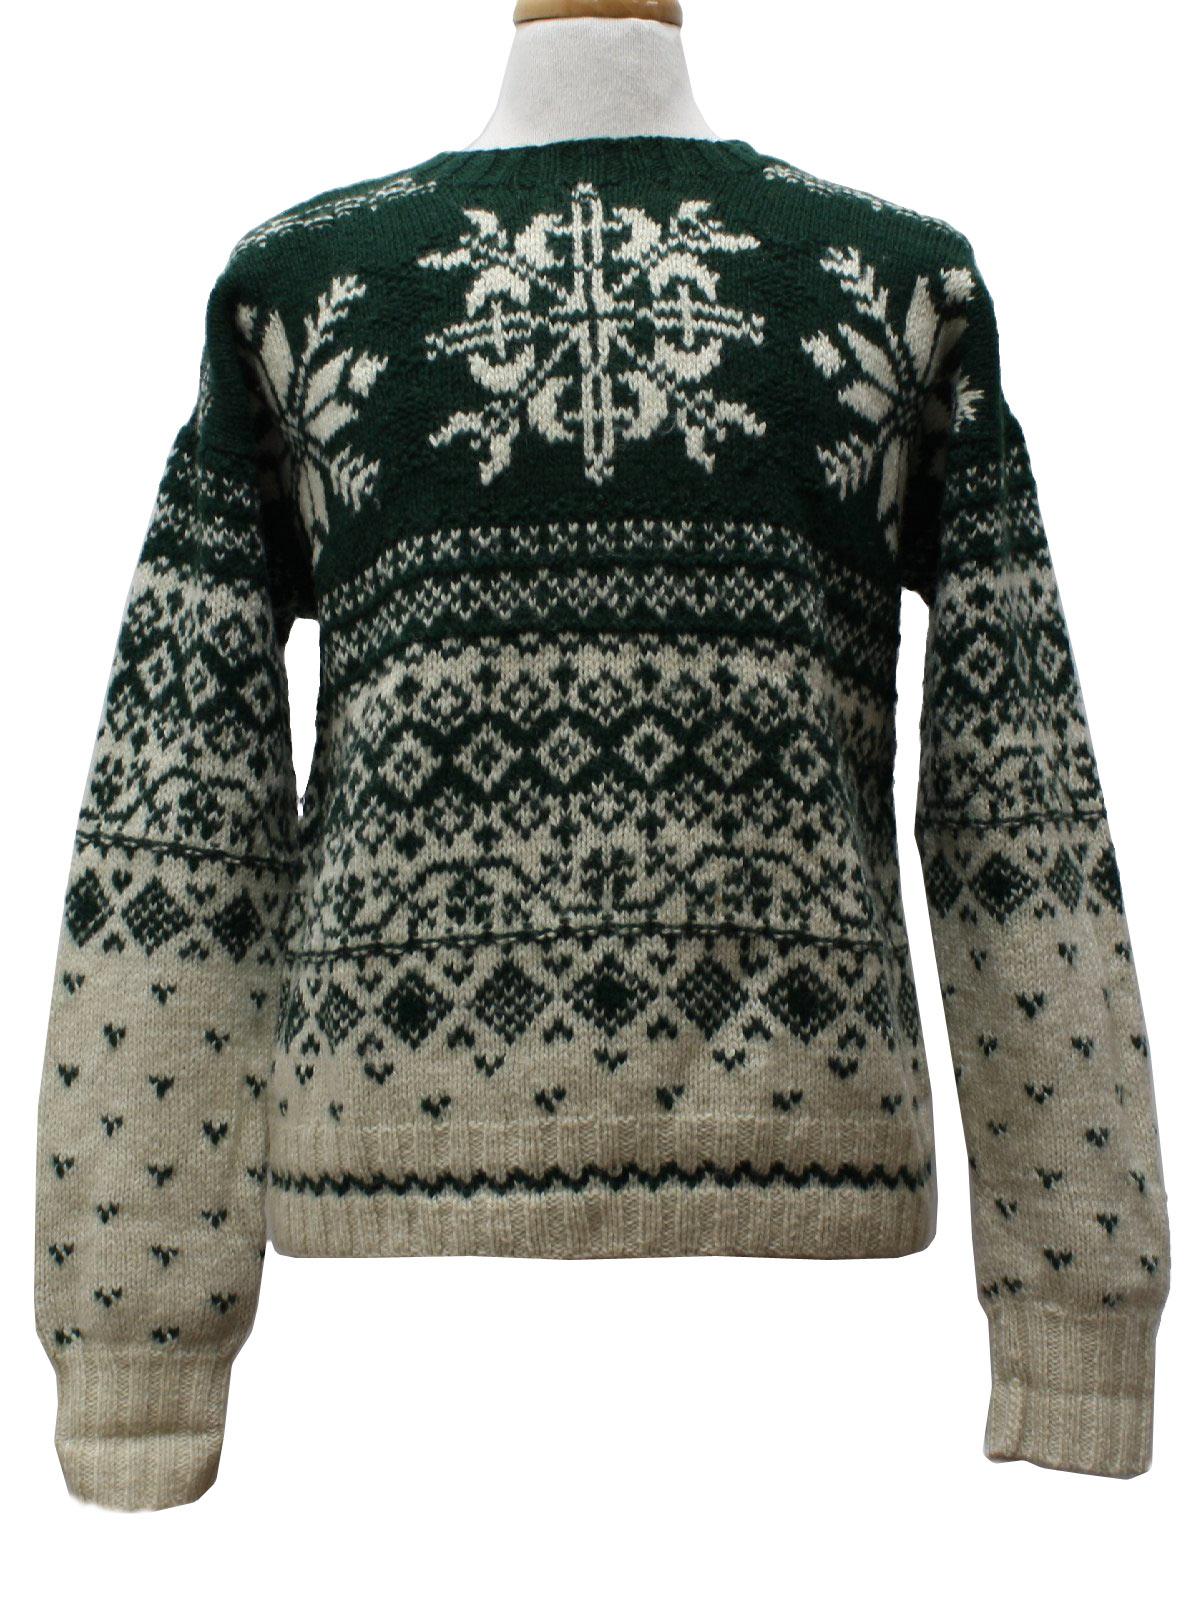 Christmas Ski Sweater Gap Unisex Dark Green Background